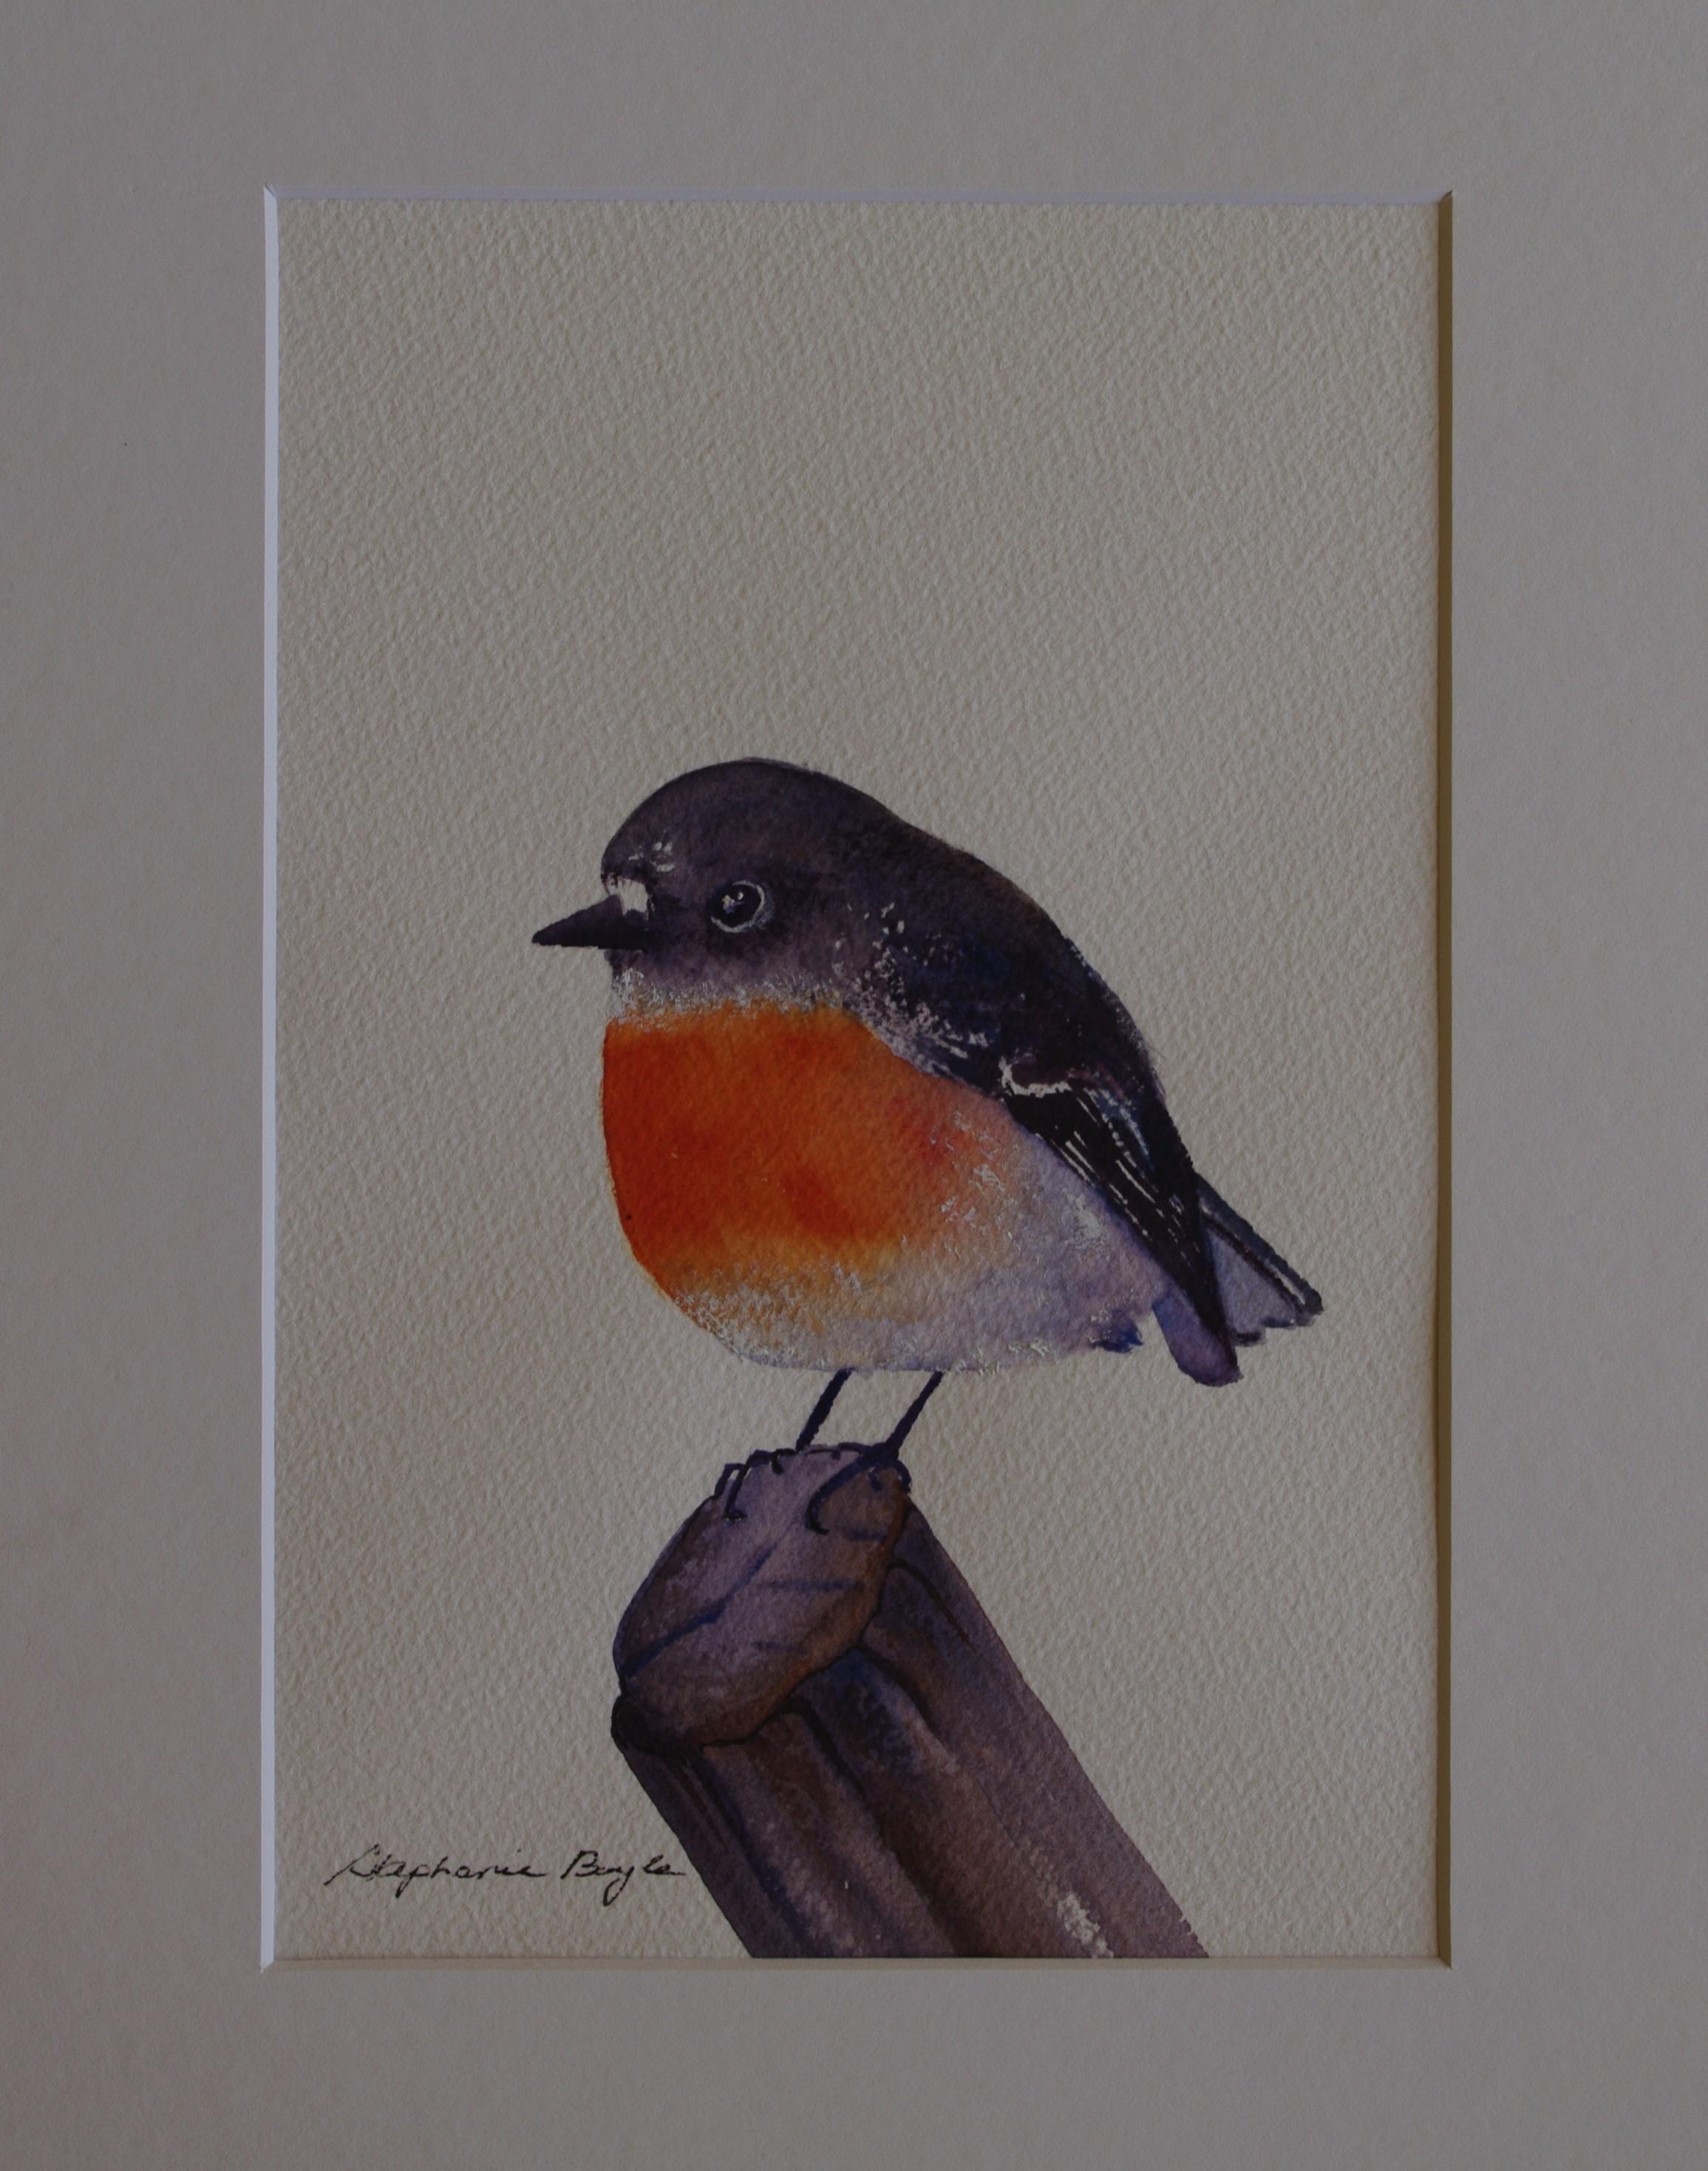 Red Robin  17cm x 22cm  Original Watercolour   Unframed   $100